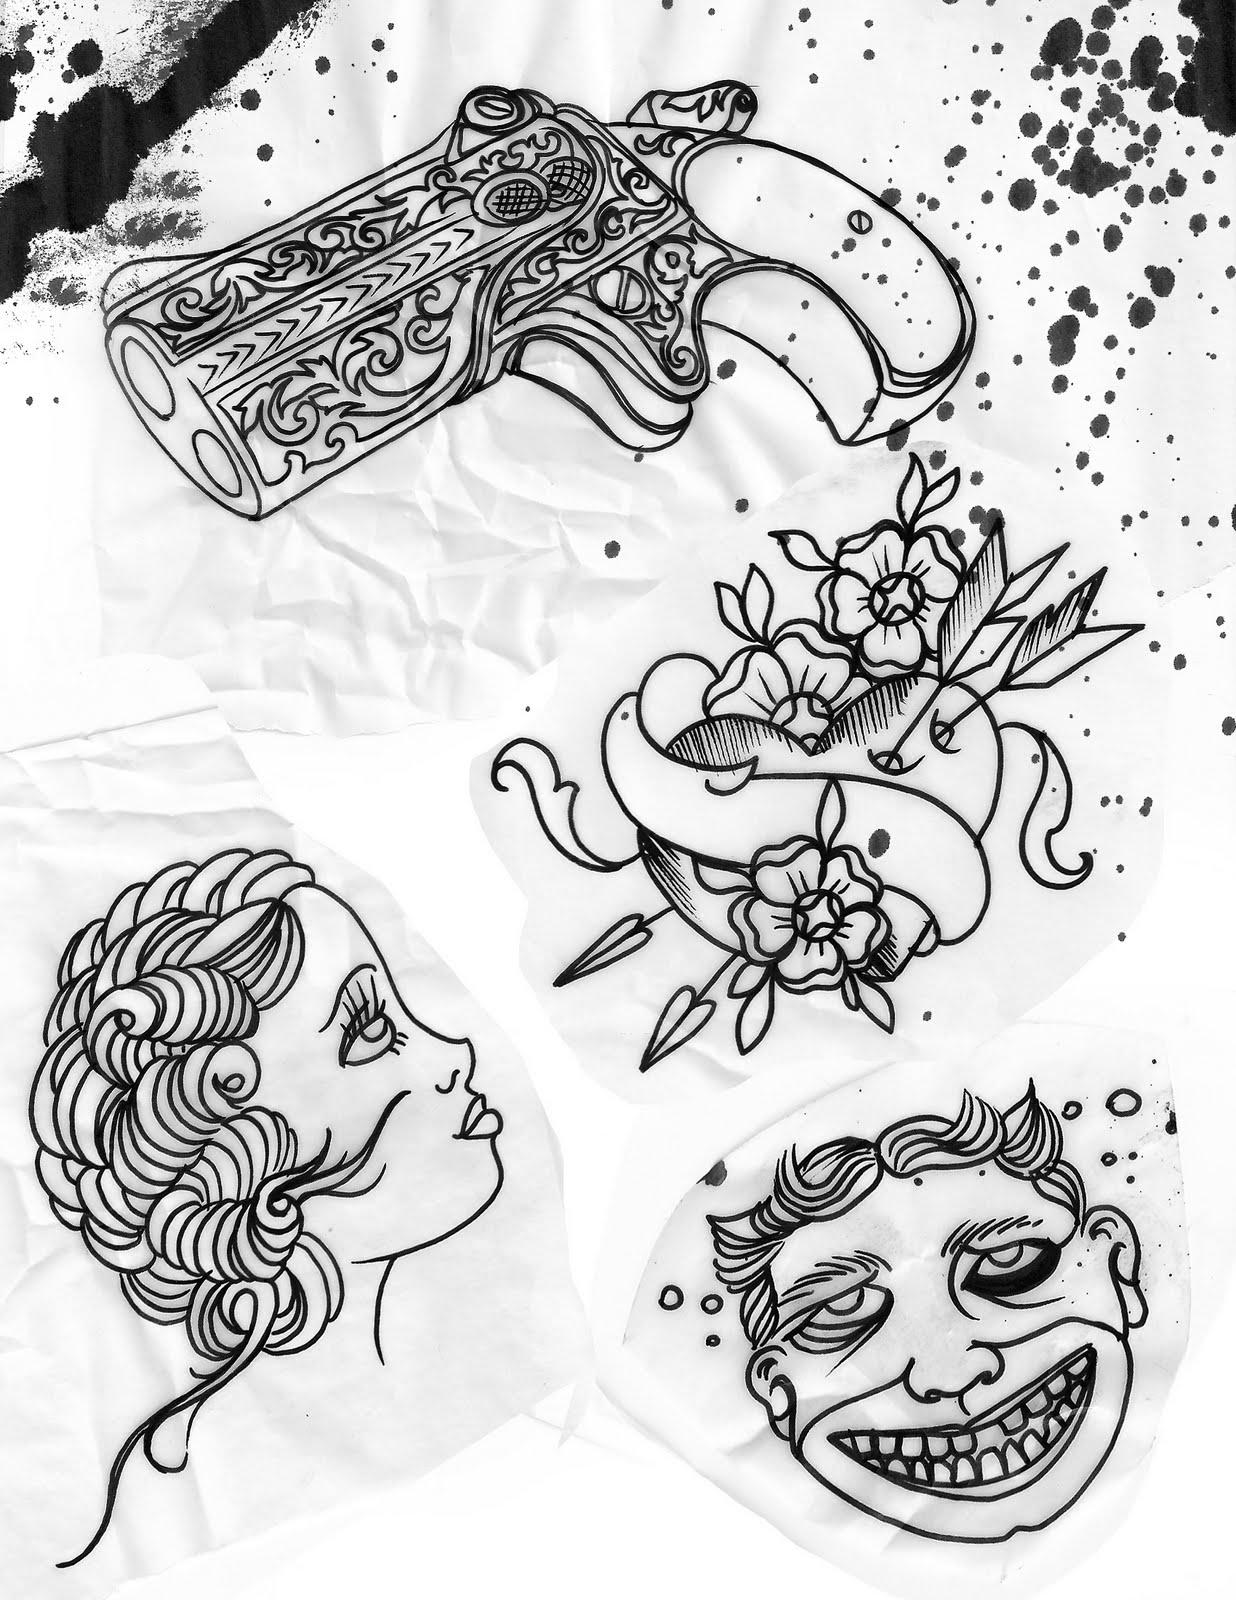 Columbus Custom Tattoo Designs: The Skinny: Citizen-Ink Blog: 50% Off Custom Tattoo